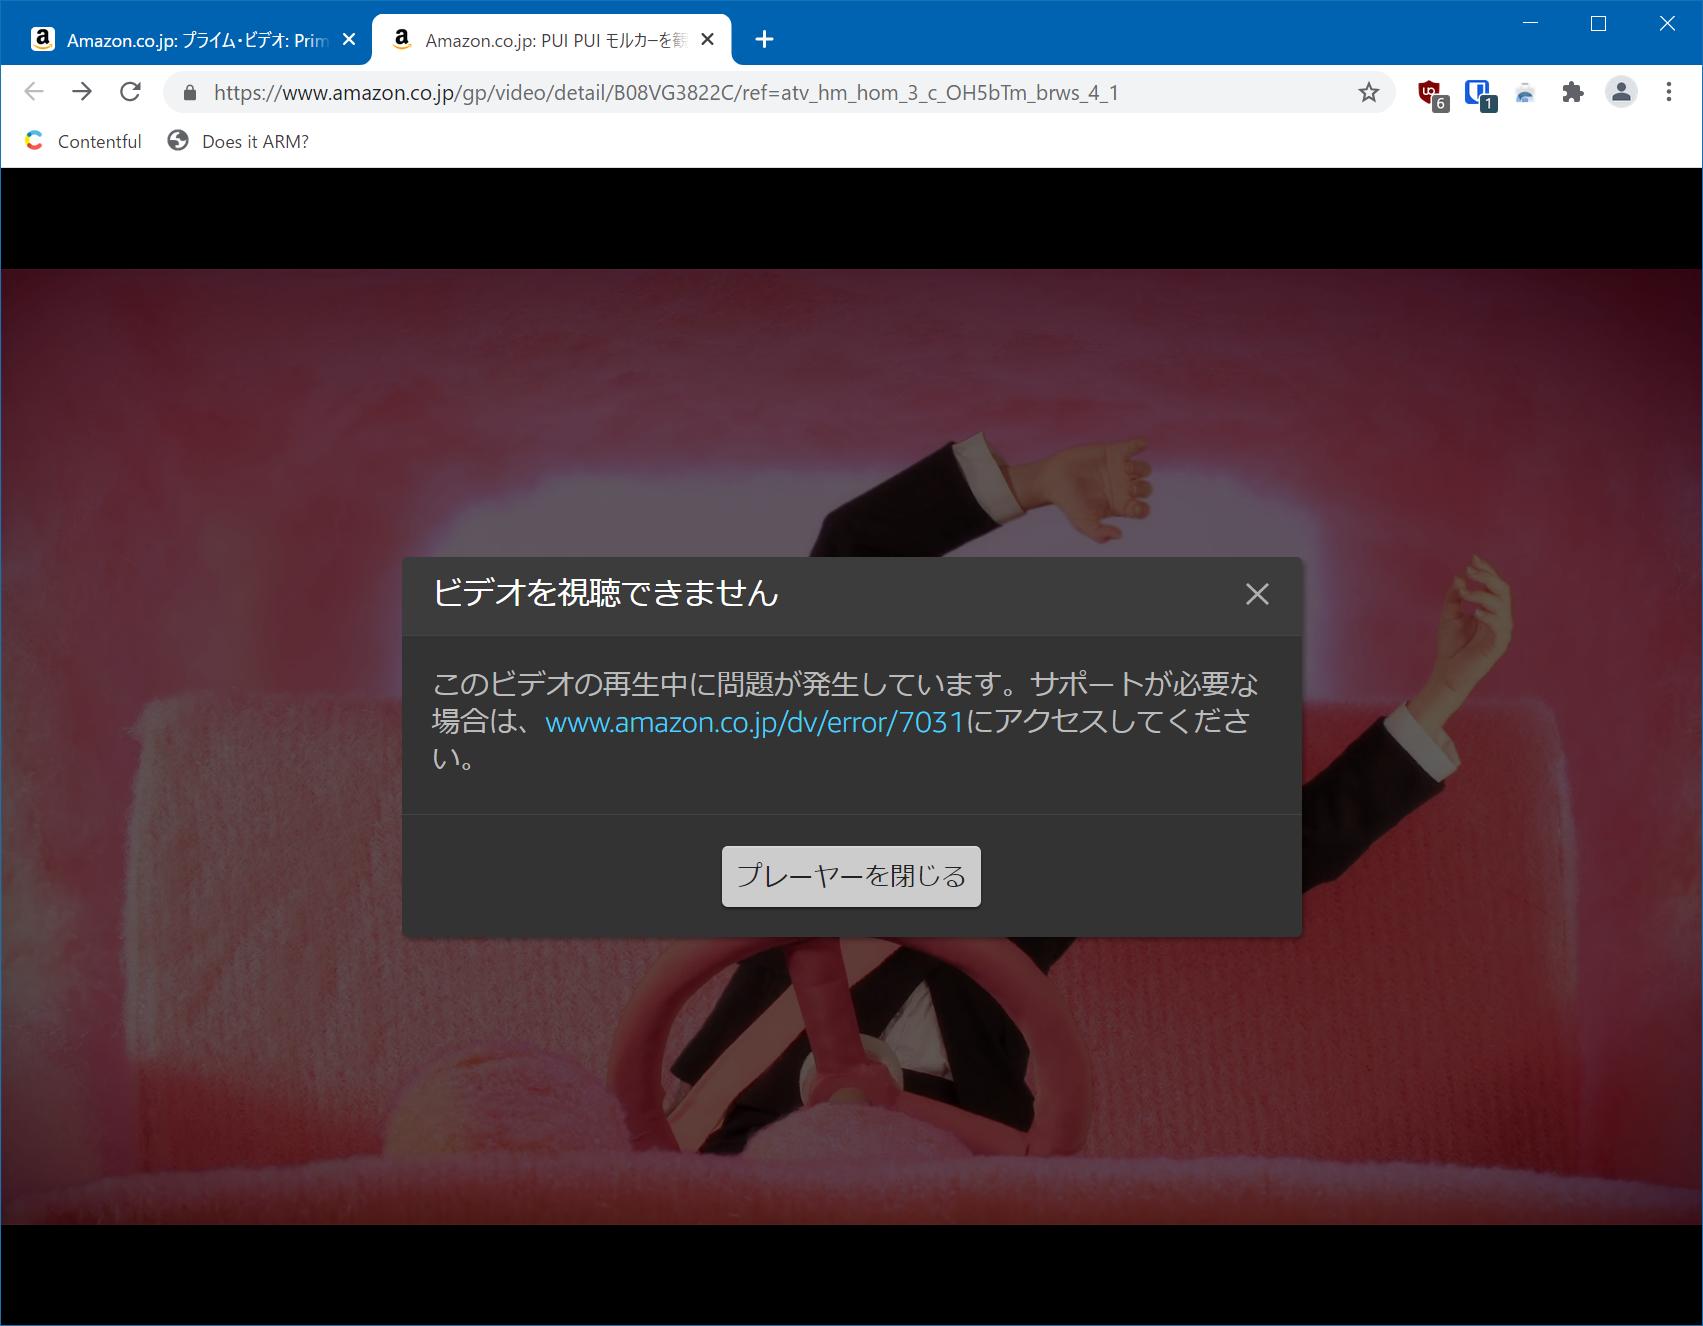 018 Amazon.co.jp: PUI PUI モルカーを観る   Prime Video - Chromium